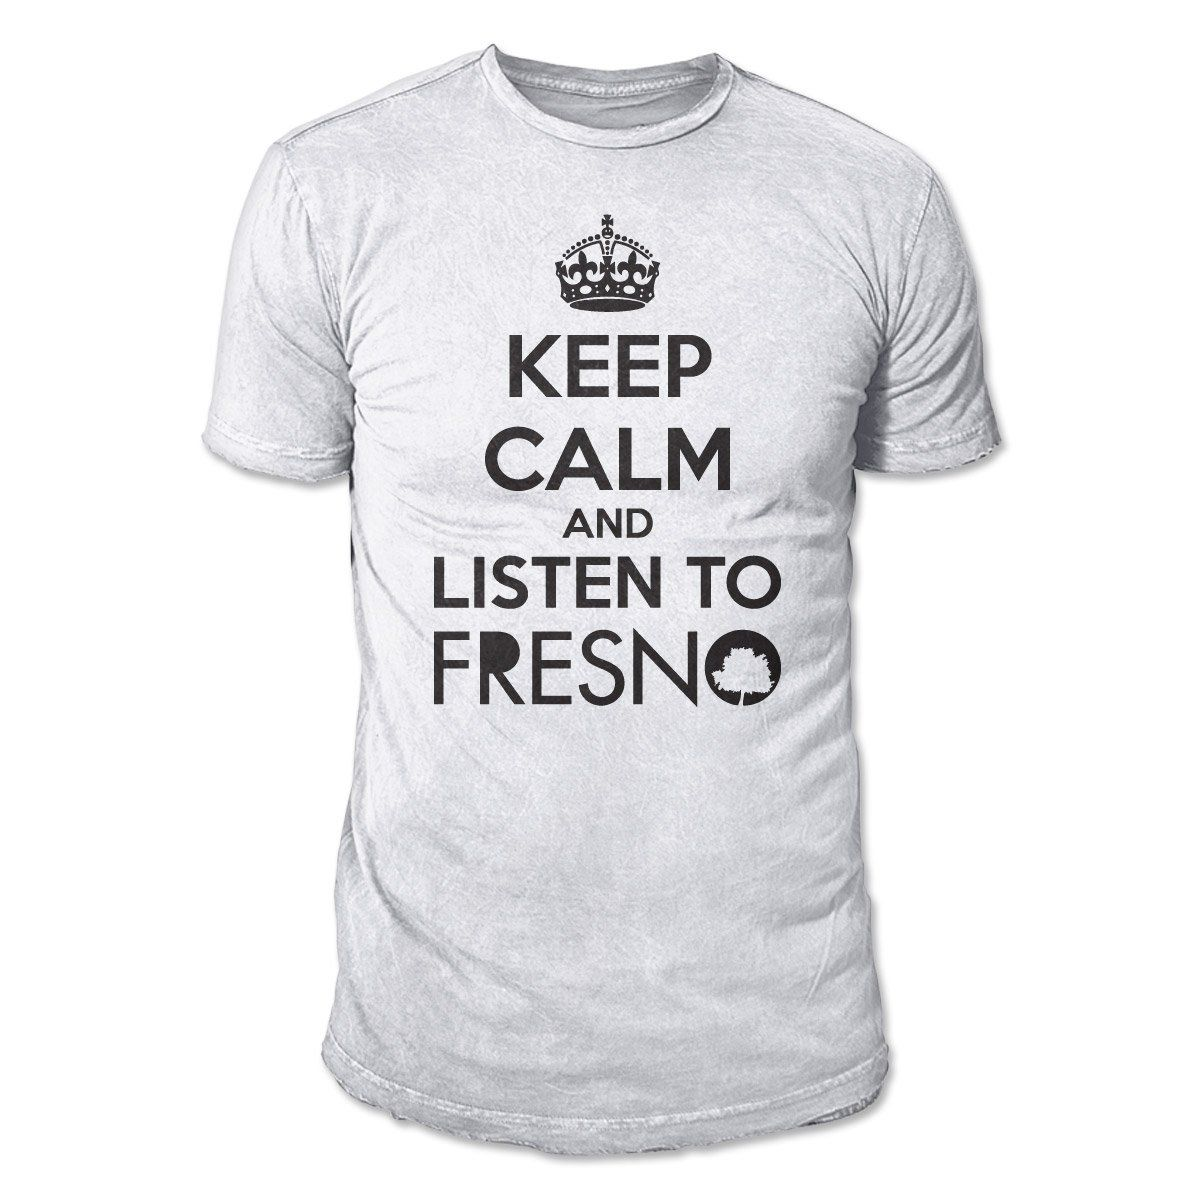 Camiseta Masculina Fresno - Keep Calm White